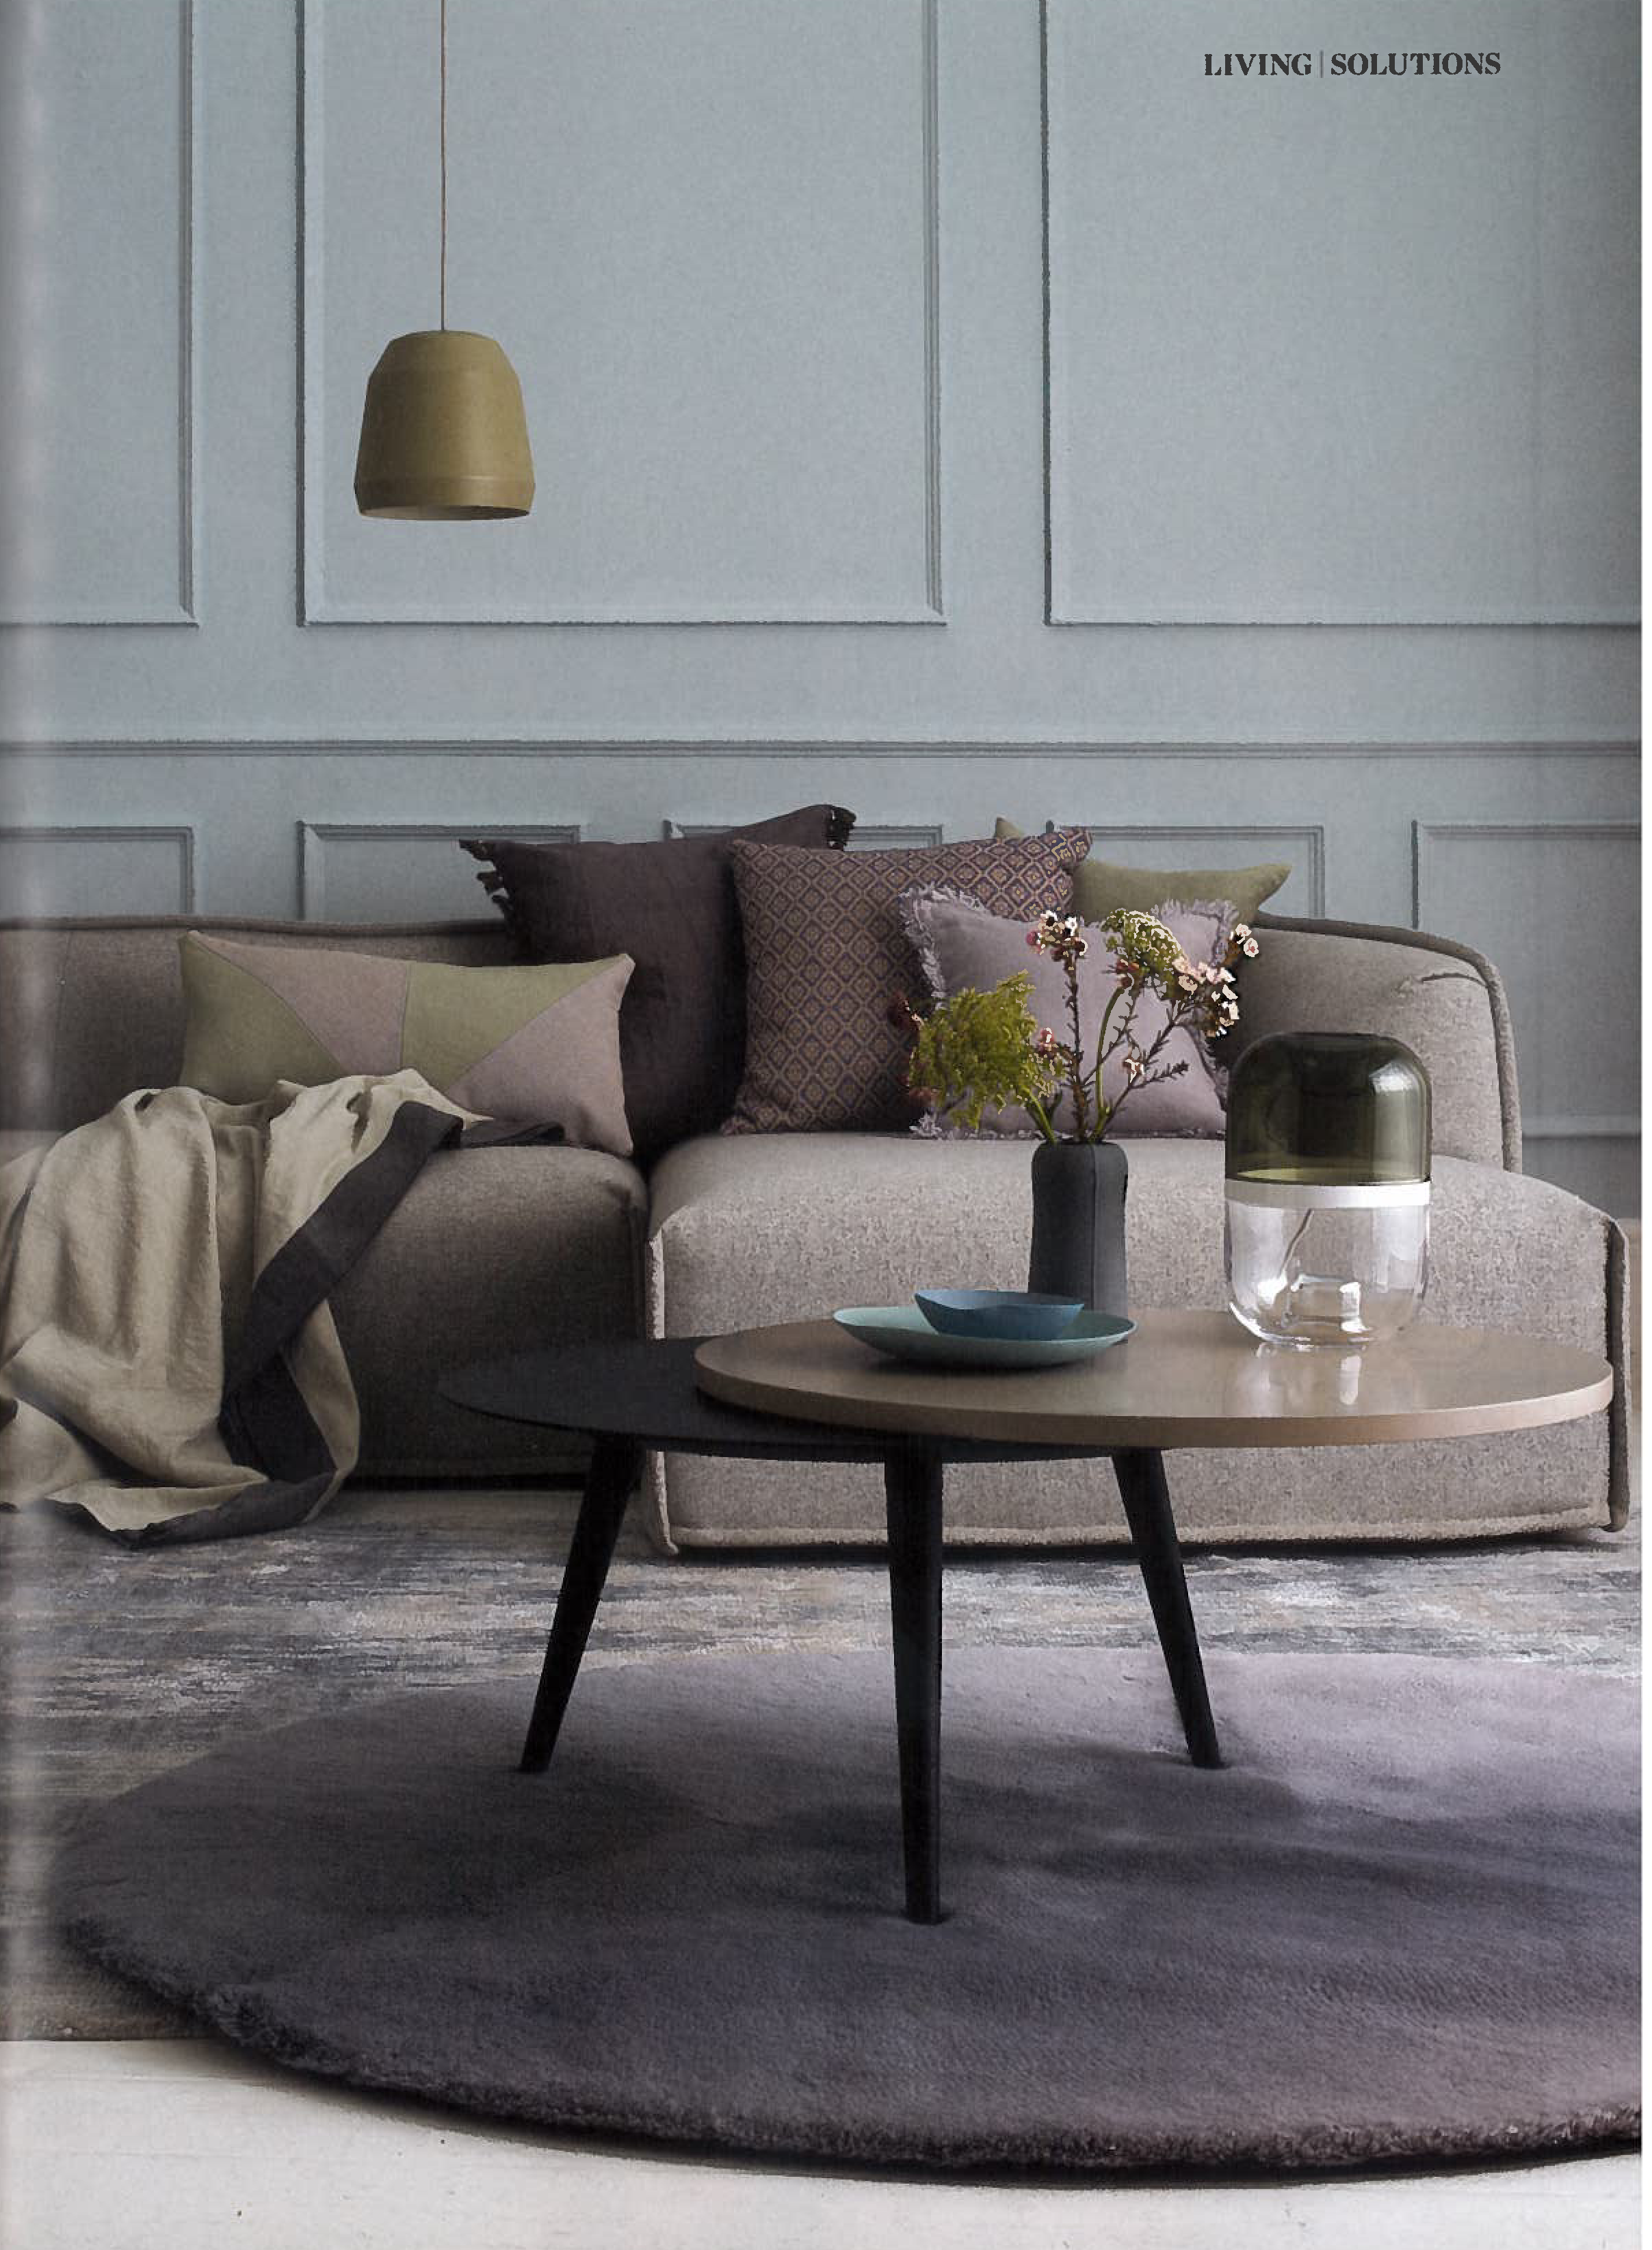 Esszimmer leuchtet zeitgenössisch moroso  massas sofa  elle deco april  fringe cushions  area